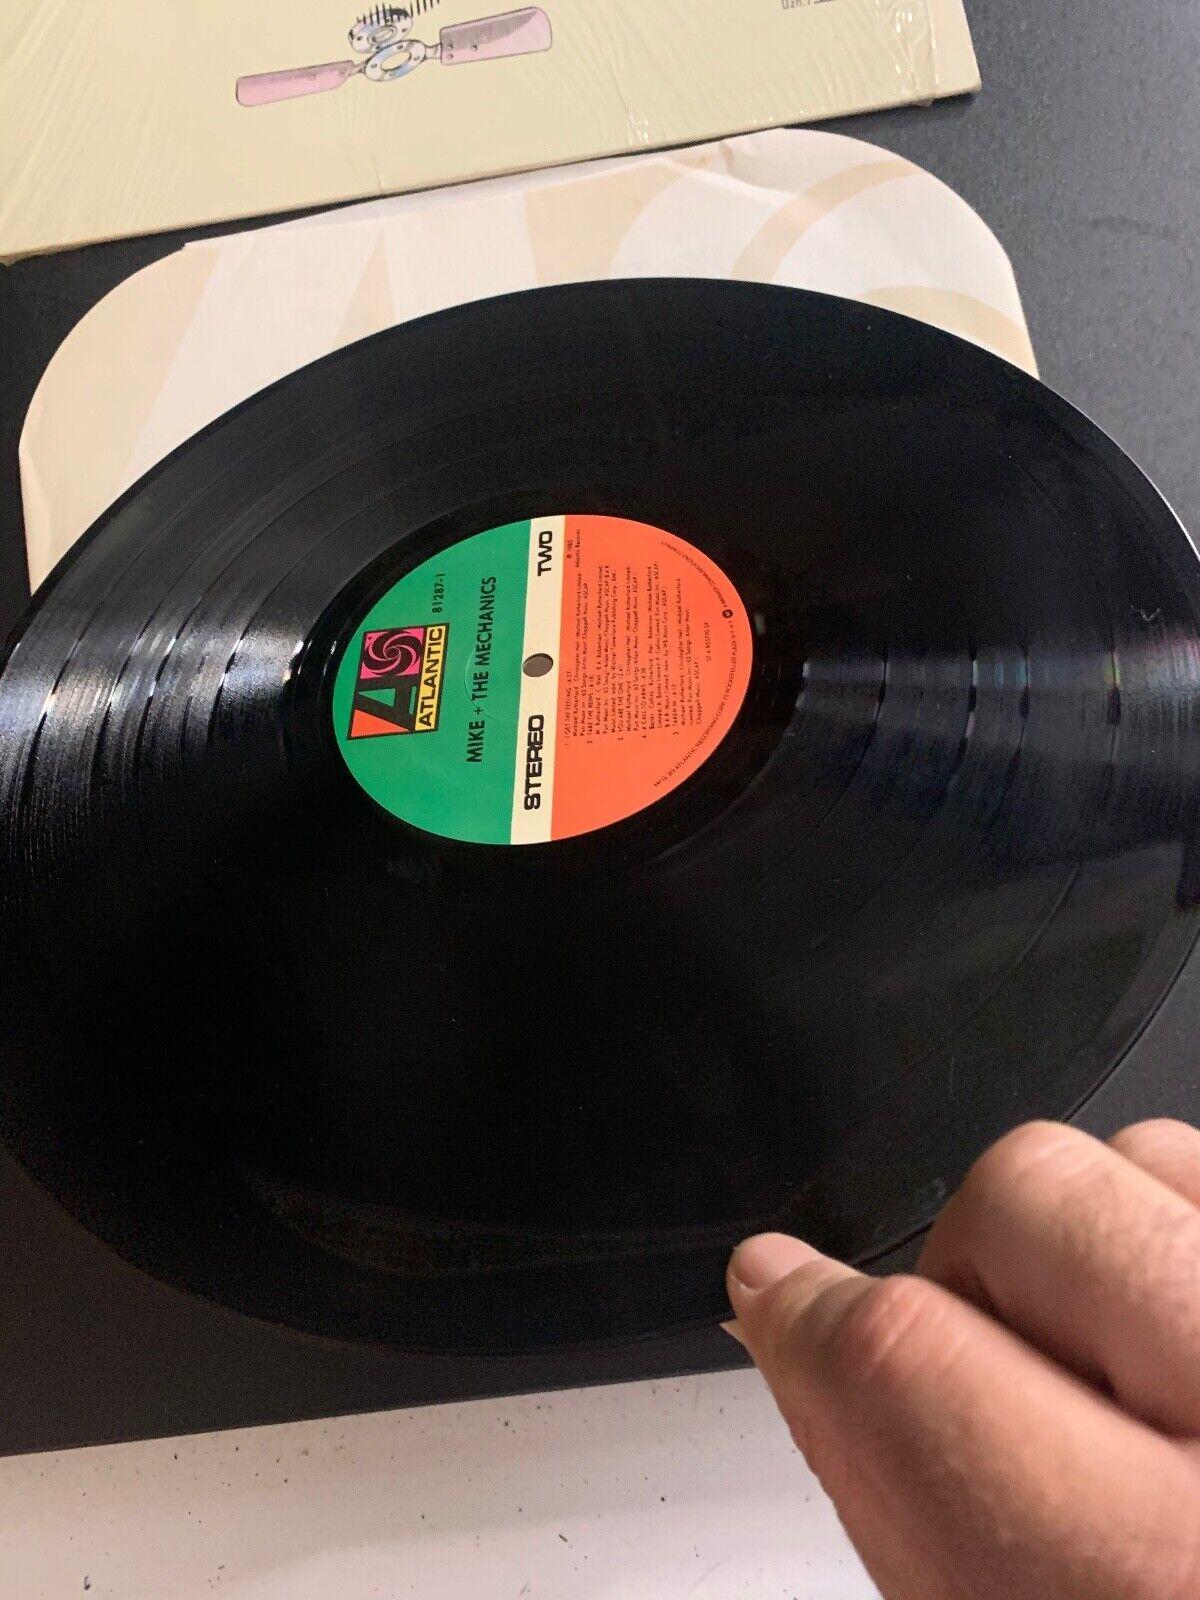 LP RECORD - MIKE THE MECHANICS - ATLANTIC RECORDS - $9.99